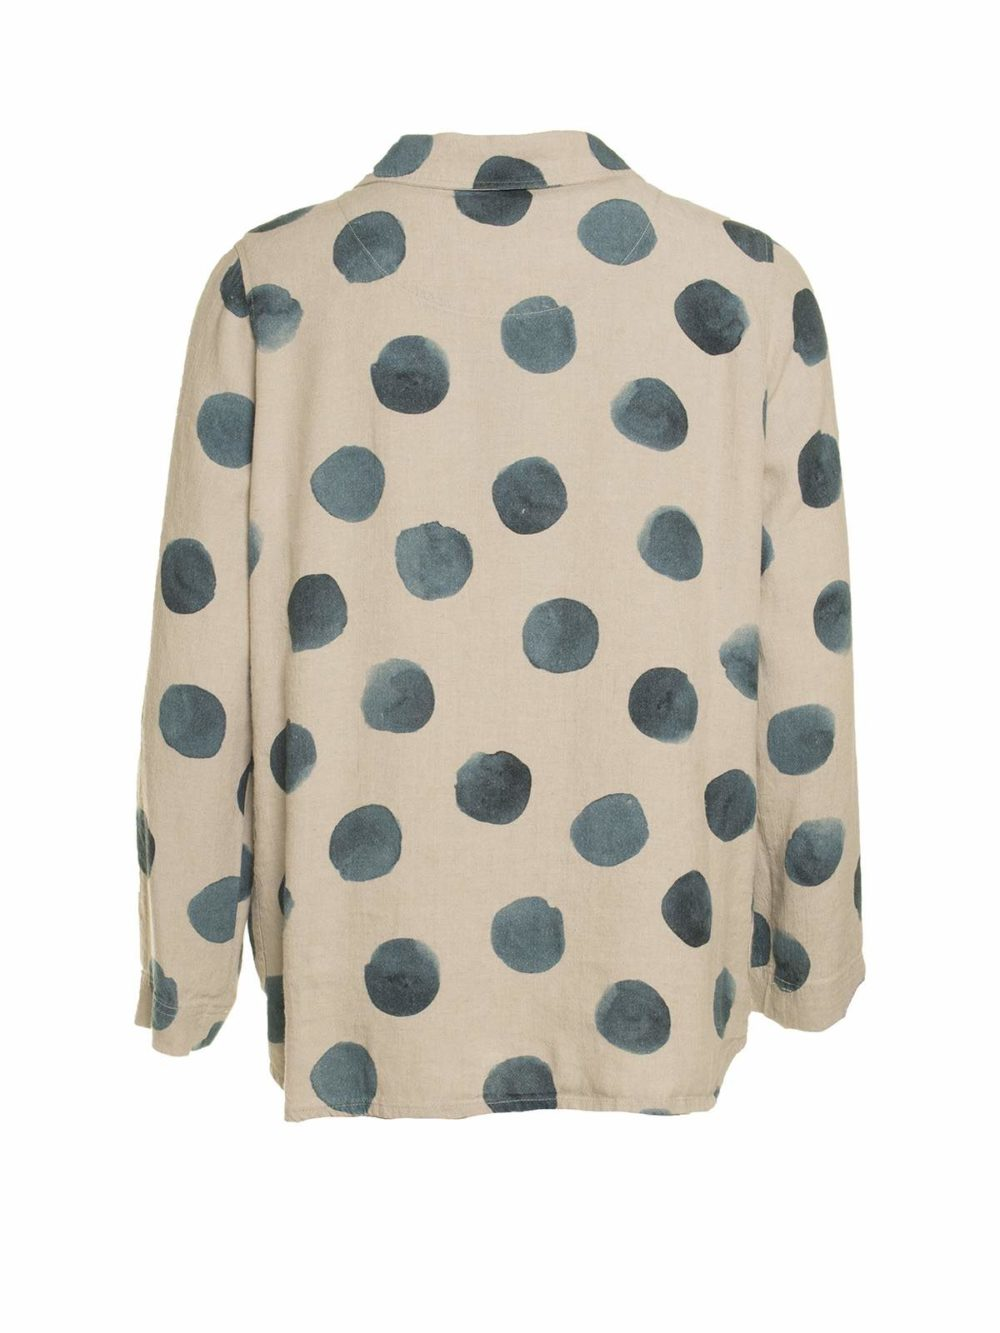 Painters Spot Shirt Sahara Katie Kerr Women's Clothing